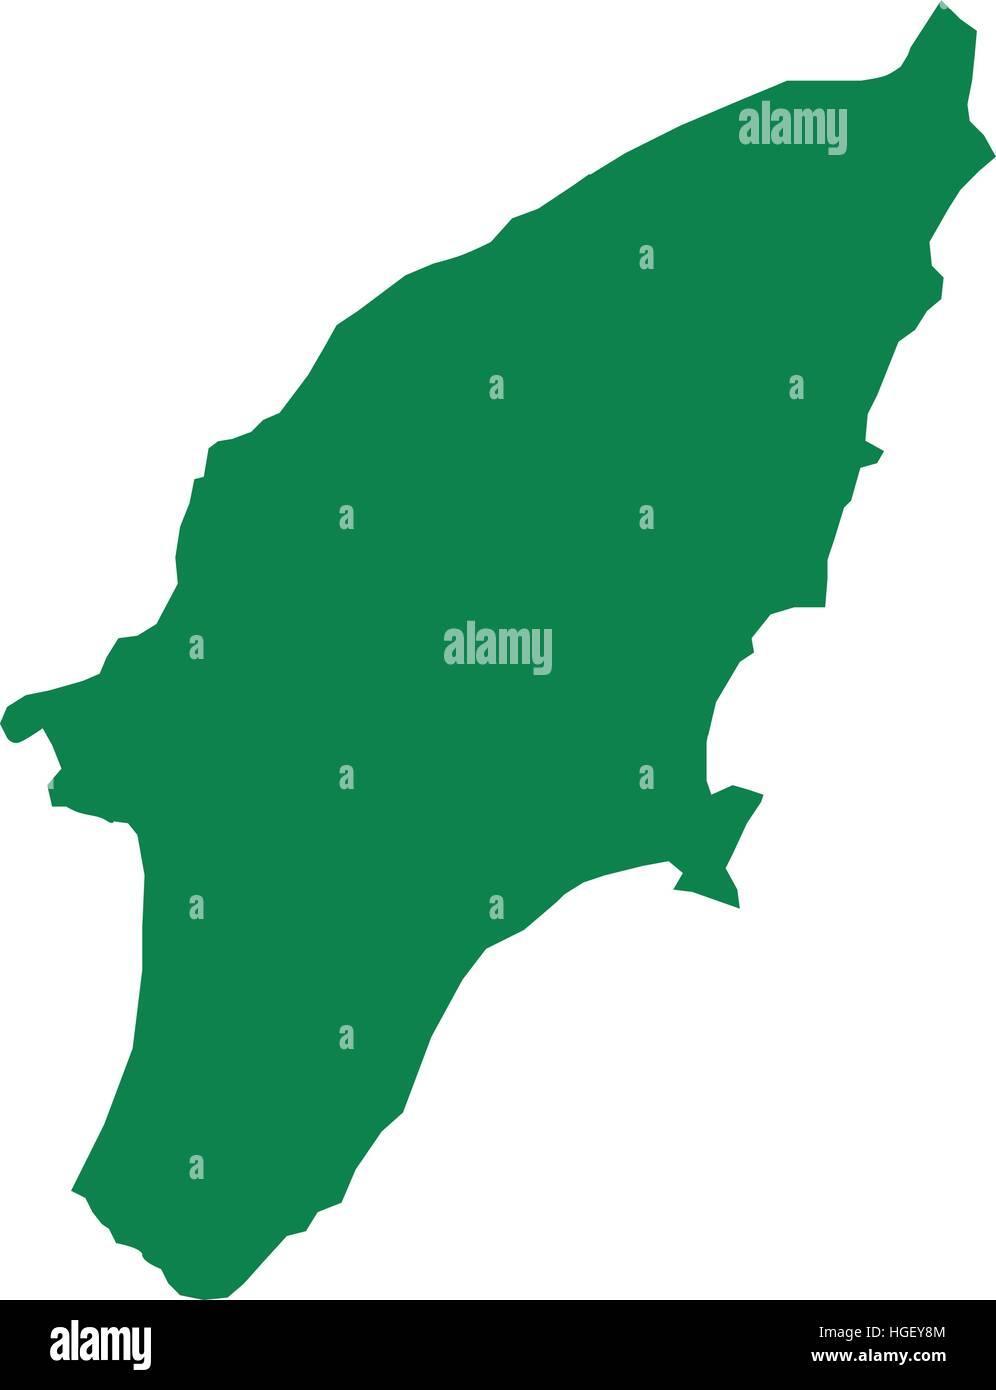 Rhodos Karte.Karte Der Insel Rhodos Vektor Abbildung Bild 130635812 Alamy